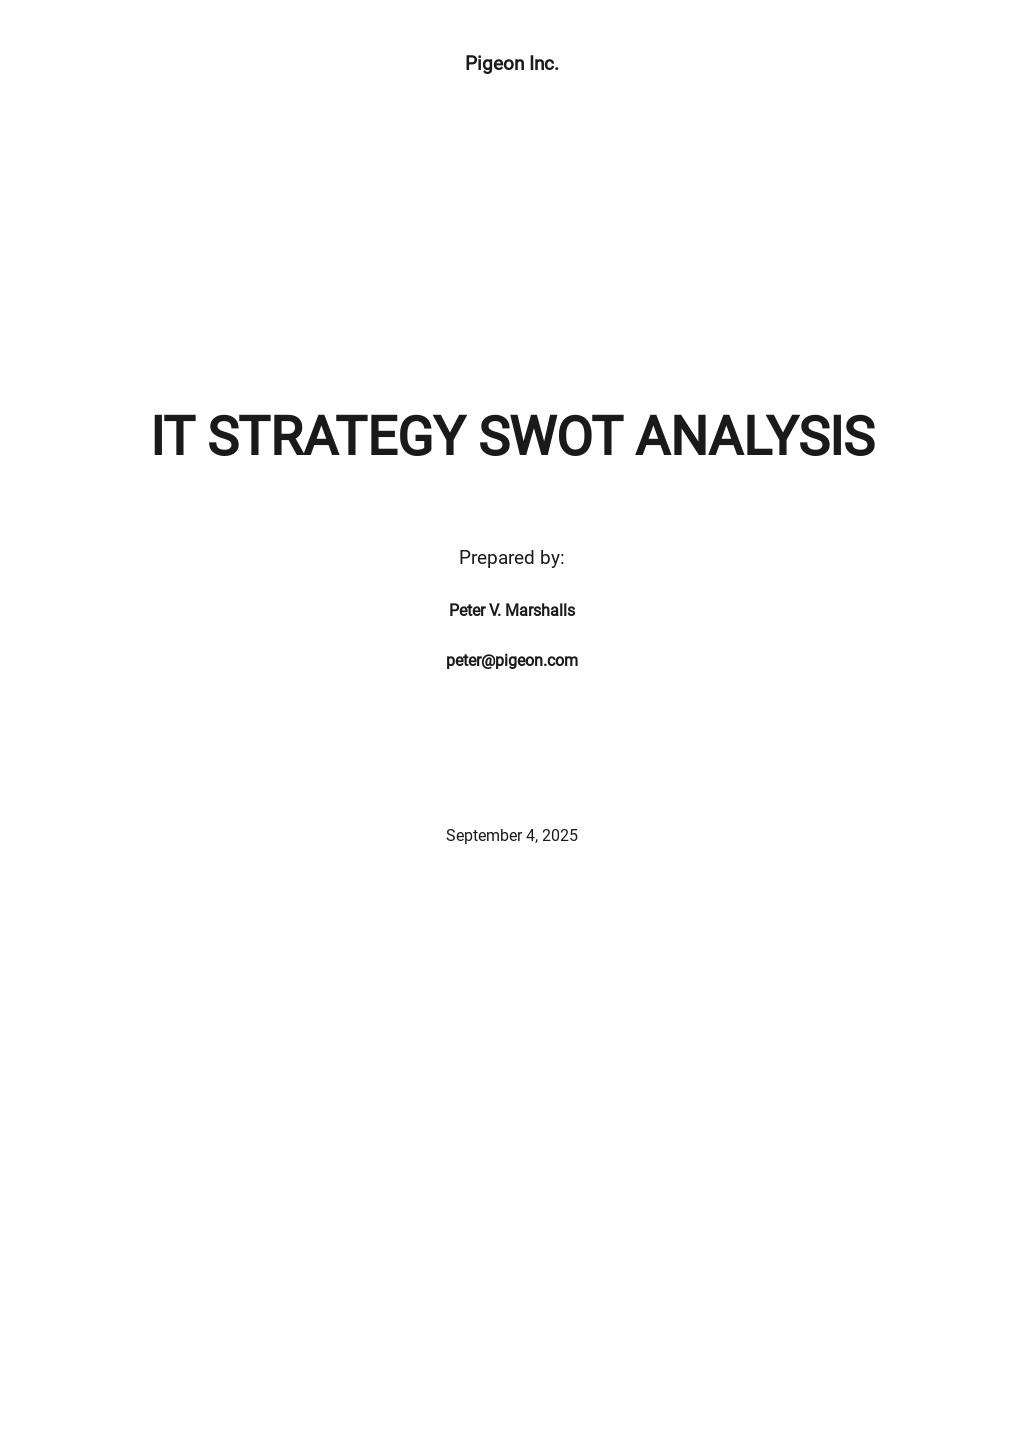 IT Strategy SWOT Analysis Template